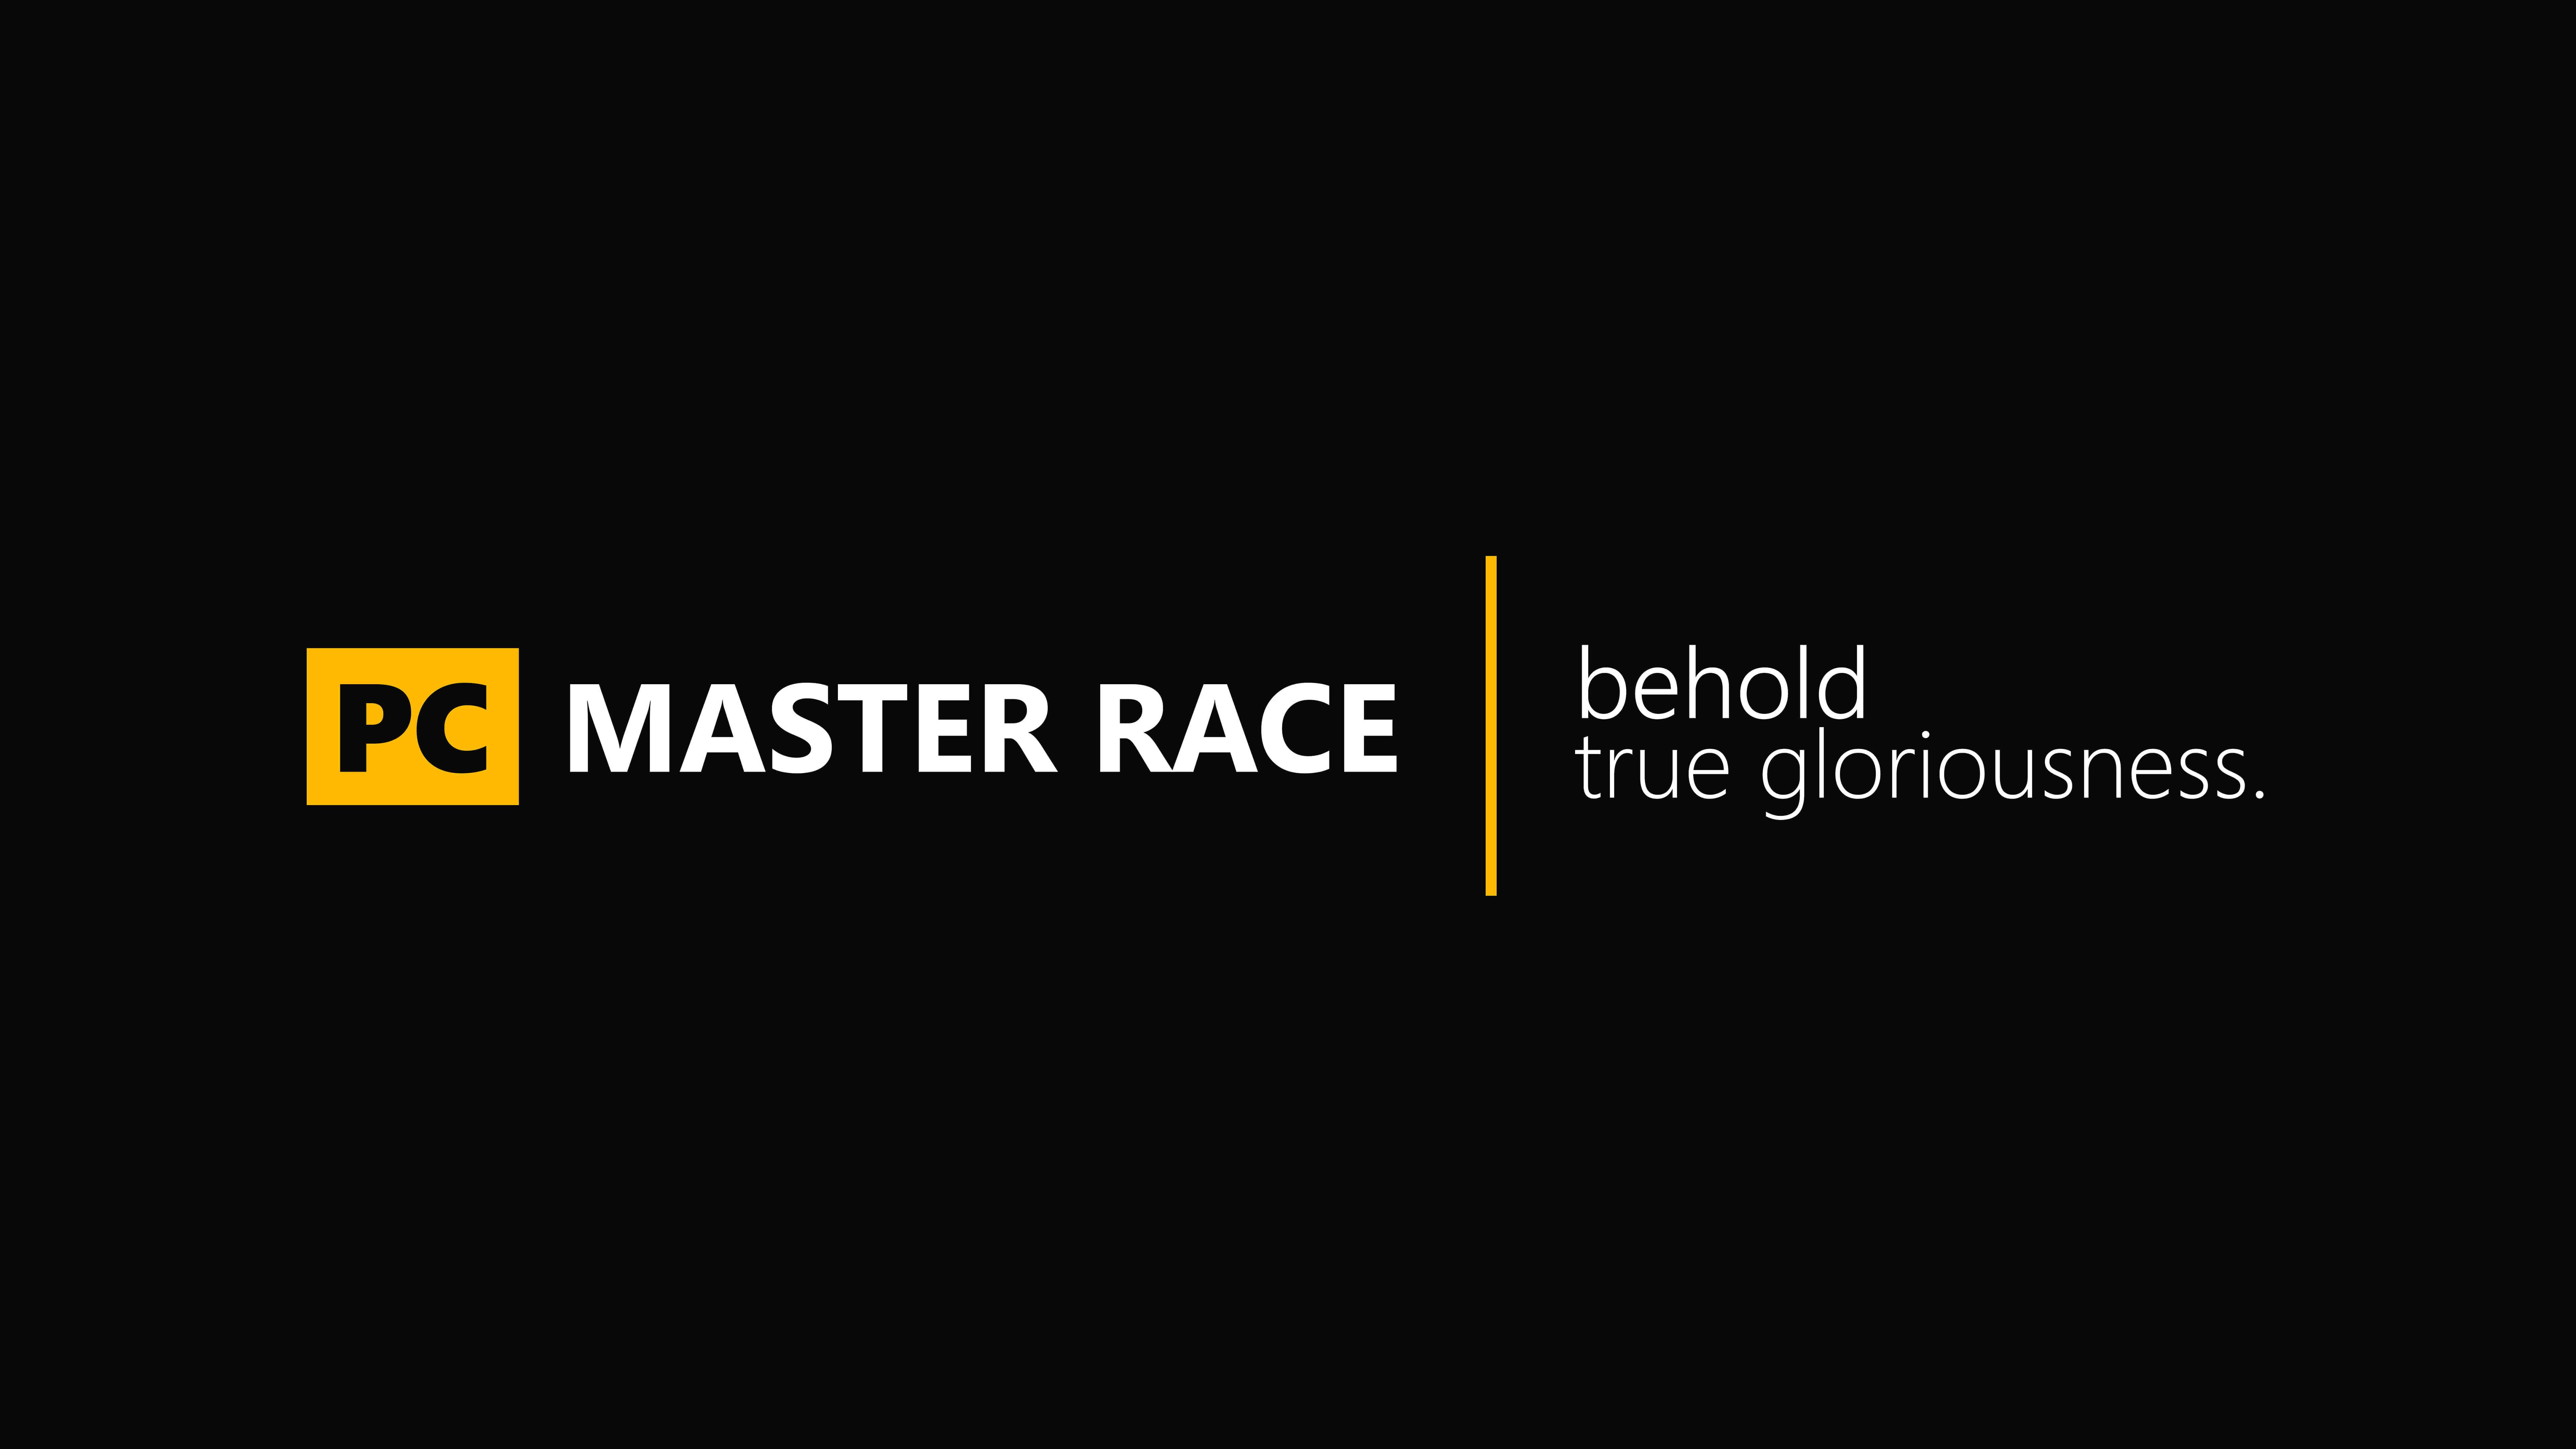 Pc Master Race Behold True Gloriousness Uhd 8k Wallpaper - Pc Master Race Black , HD Wallpaper & Backgrounds